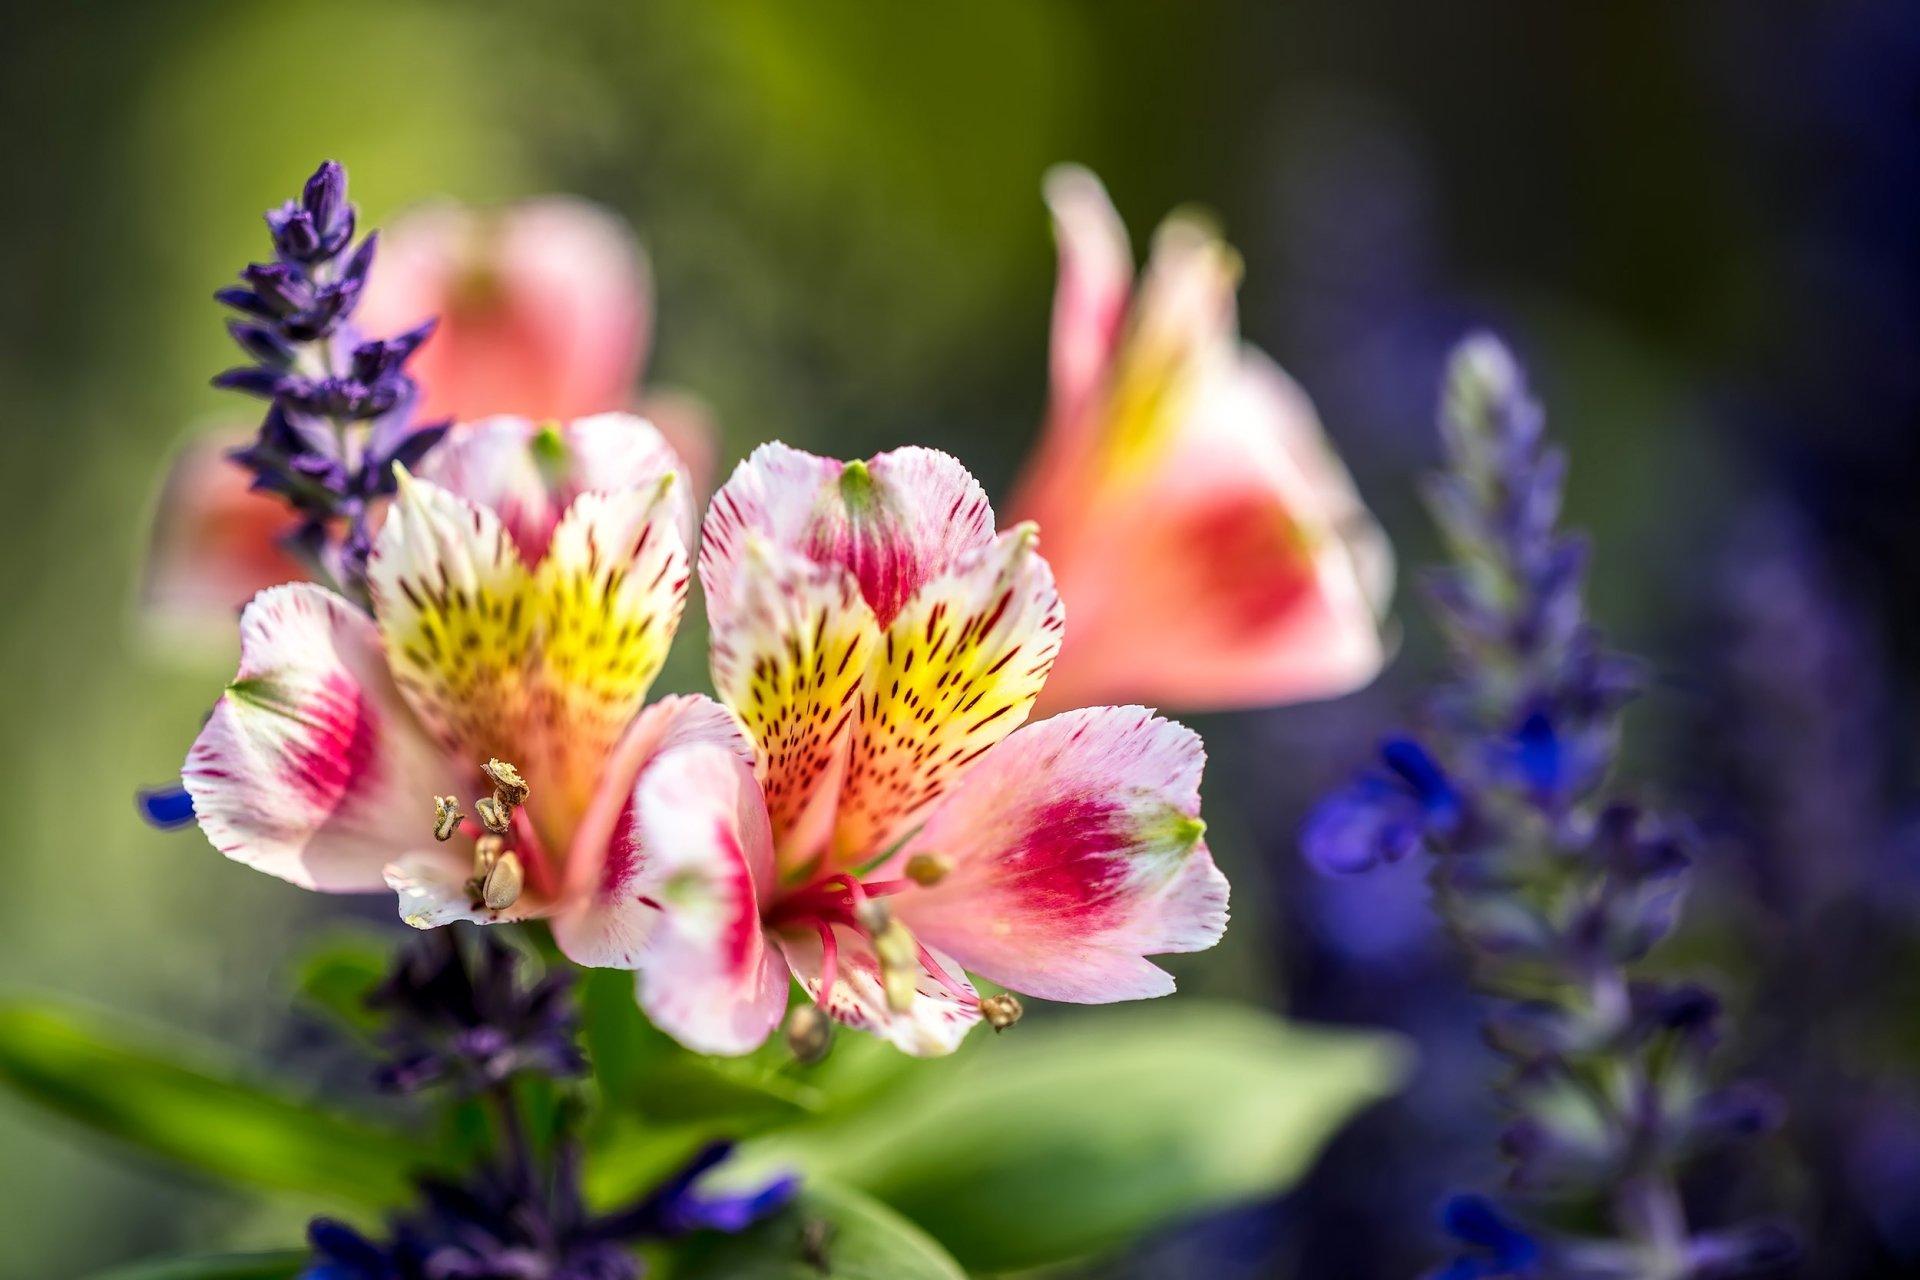 Flores Hermosas Flores Silvestres Fondos De Pantalla Gratis: Fleur Fond D'écran HD